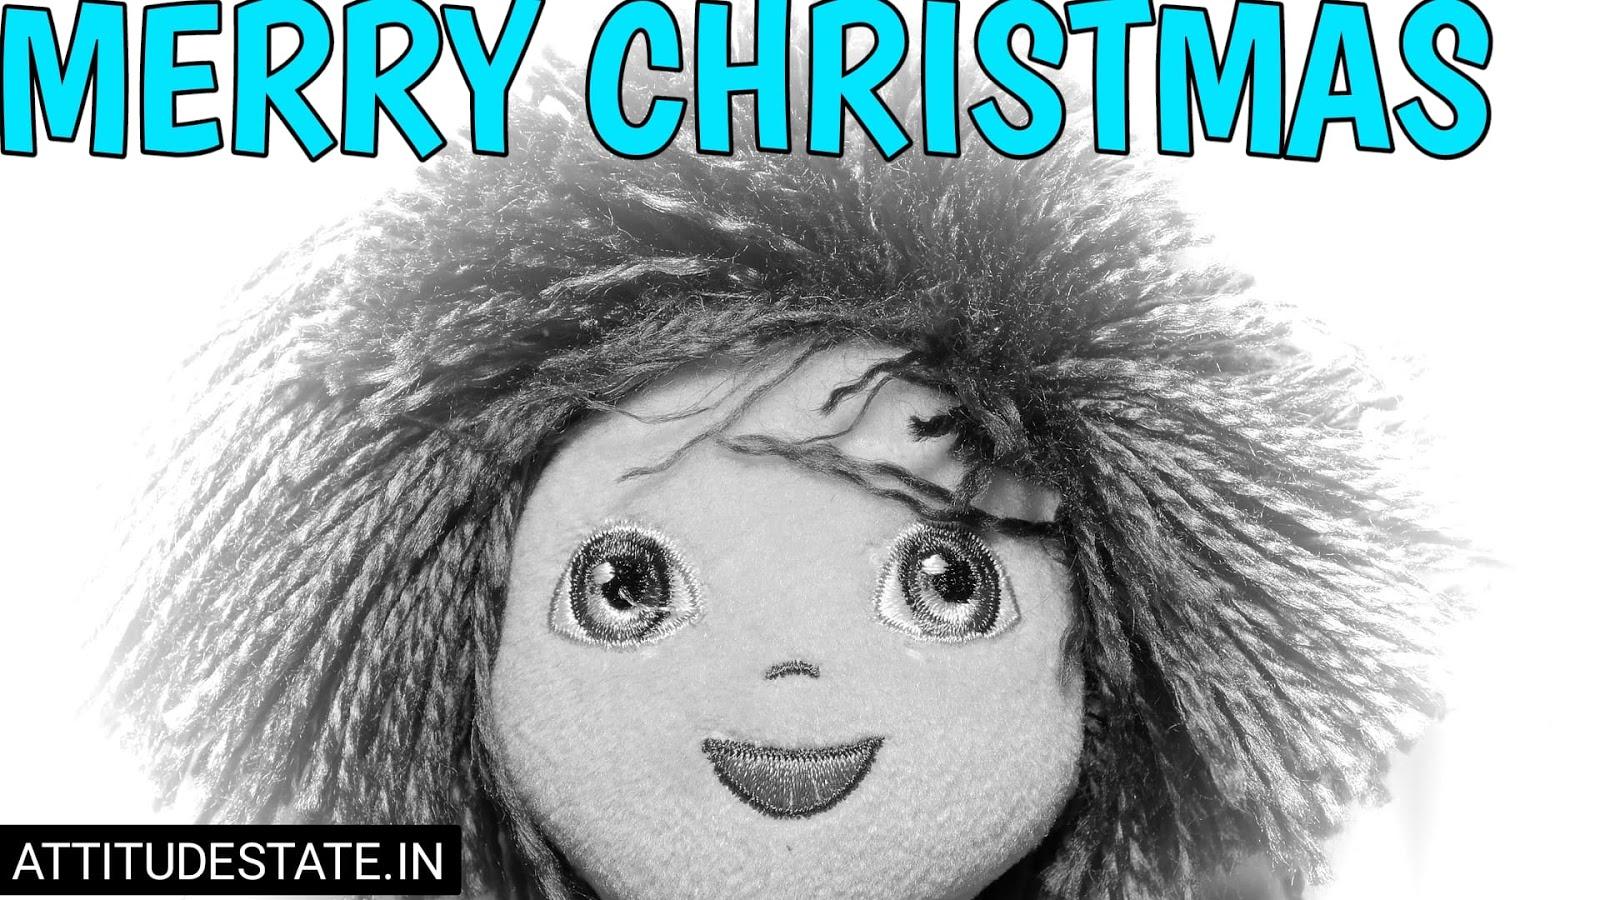 funny merry christmas 2019